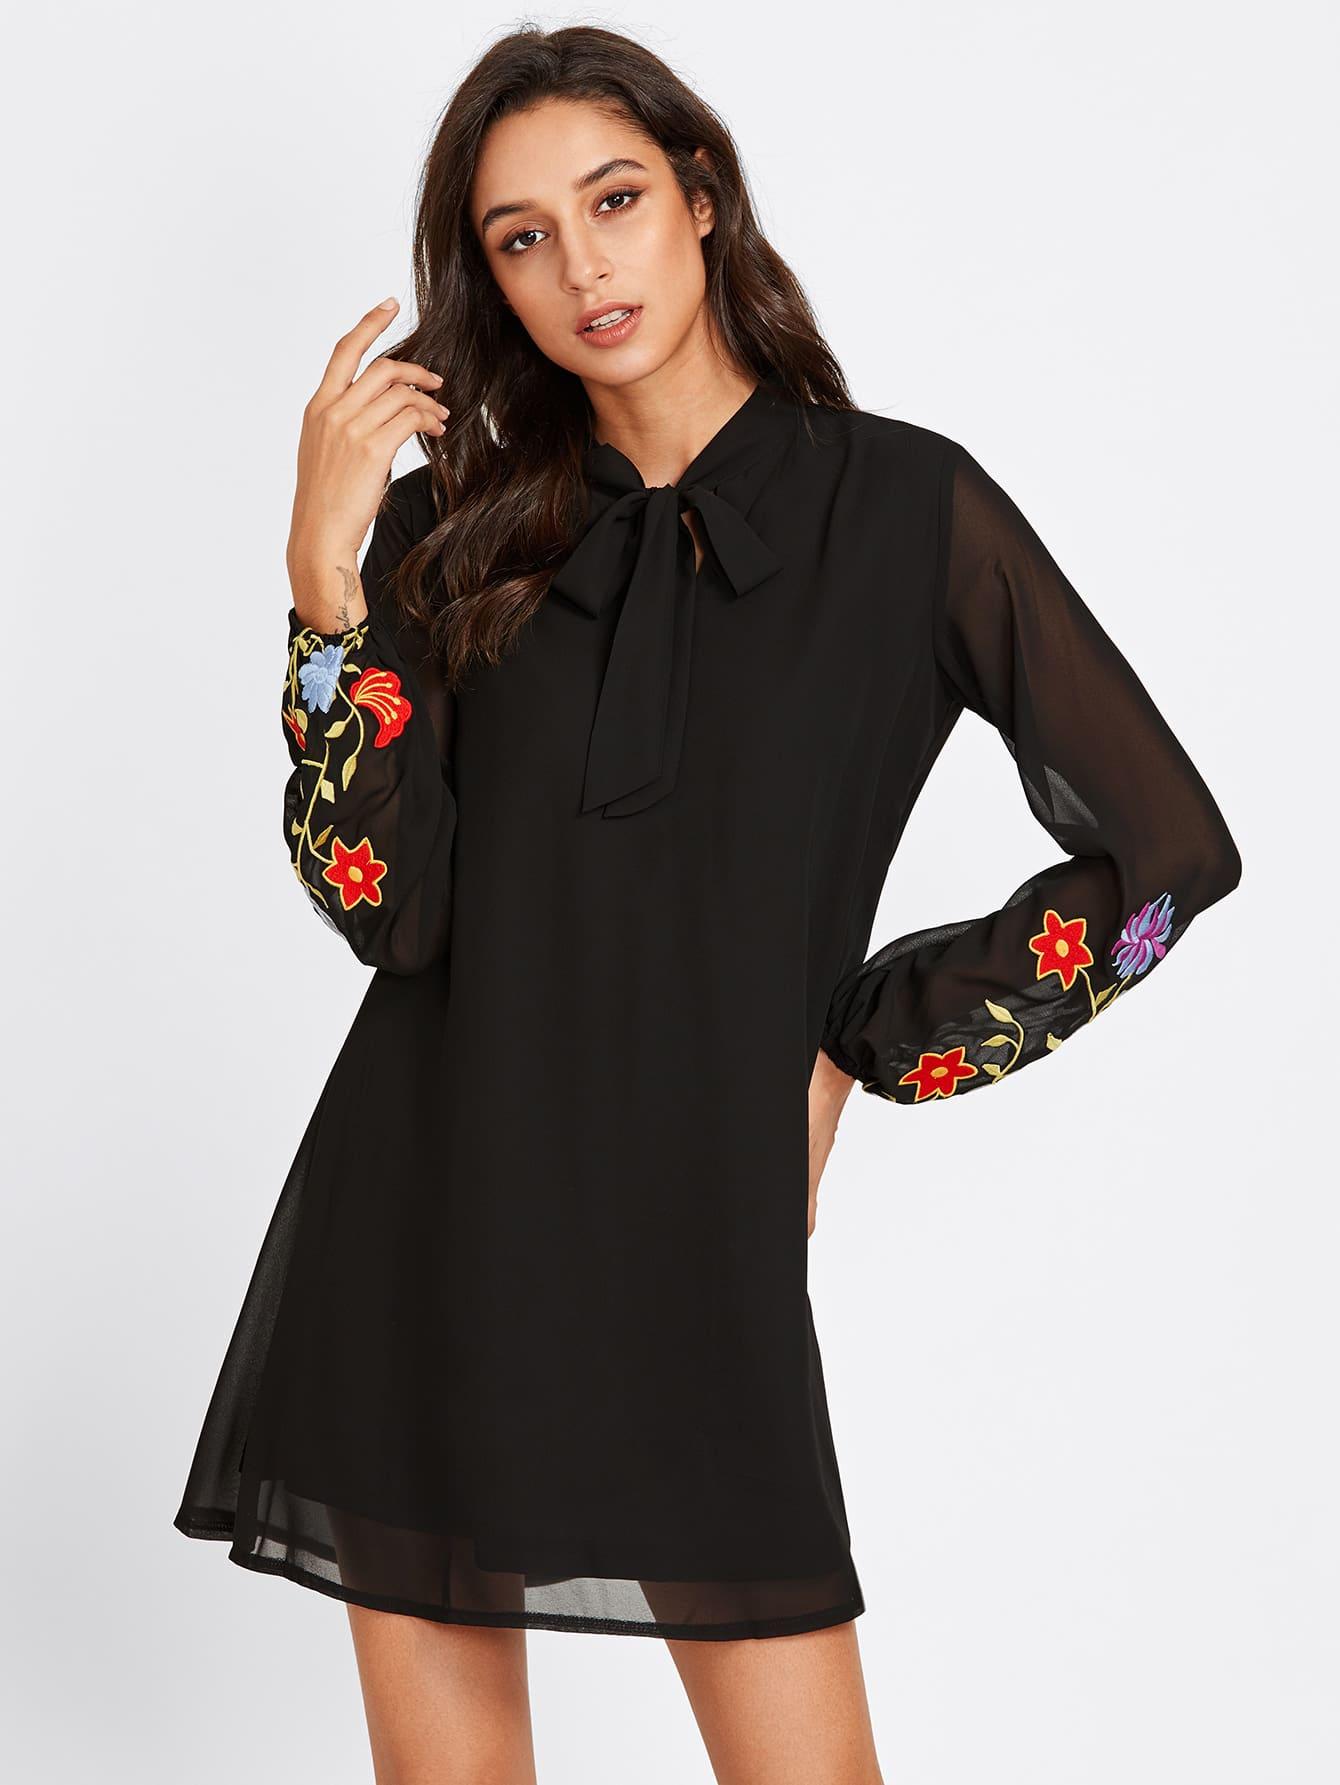 bow tie neck flower embroidered dress shein sheinside. Black Bedroom Furniture Sets. Home Design Ideas